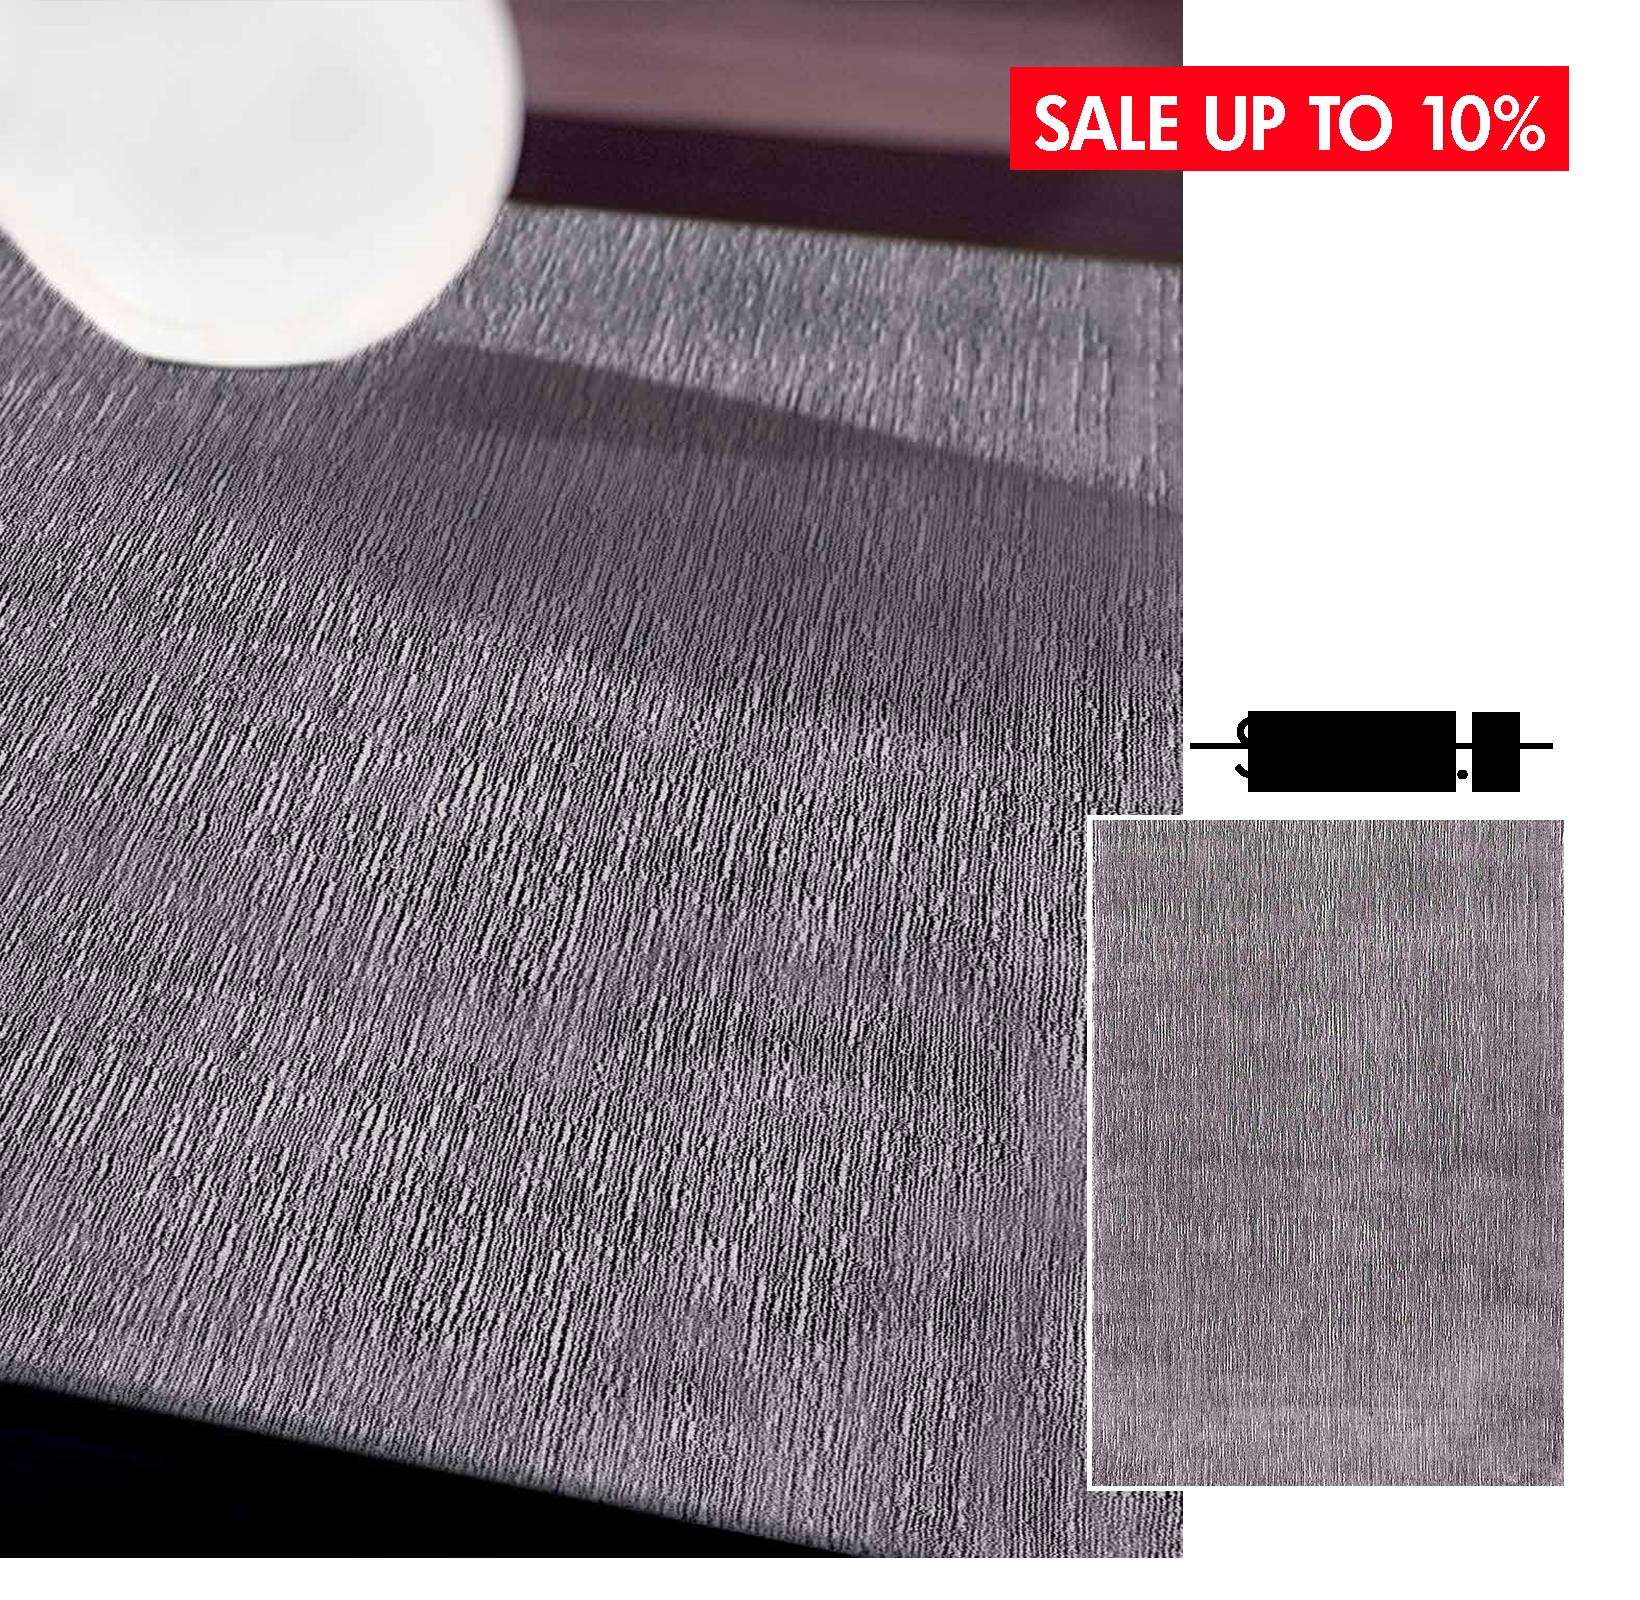 PLATFORM DUSTY LILAC - ● 190x290 cm● 60% tơ Viscose - 40% lông cừu● $ 1,387.0